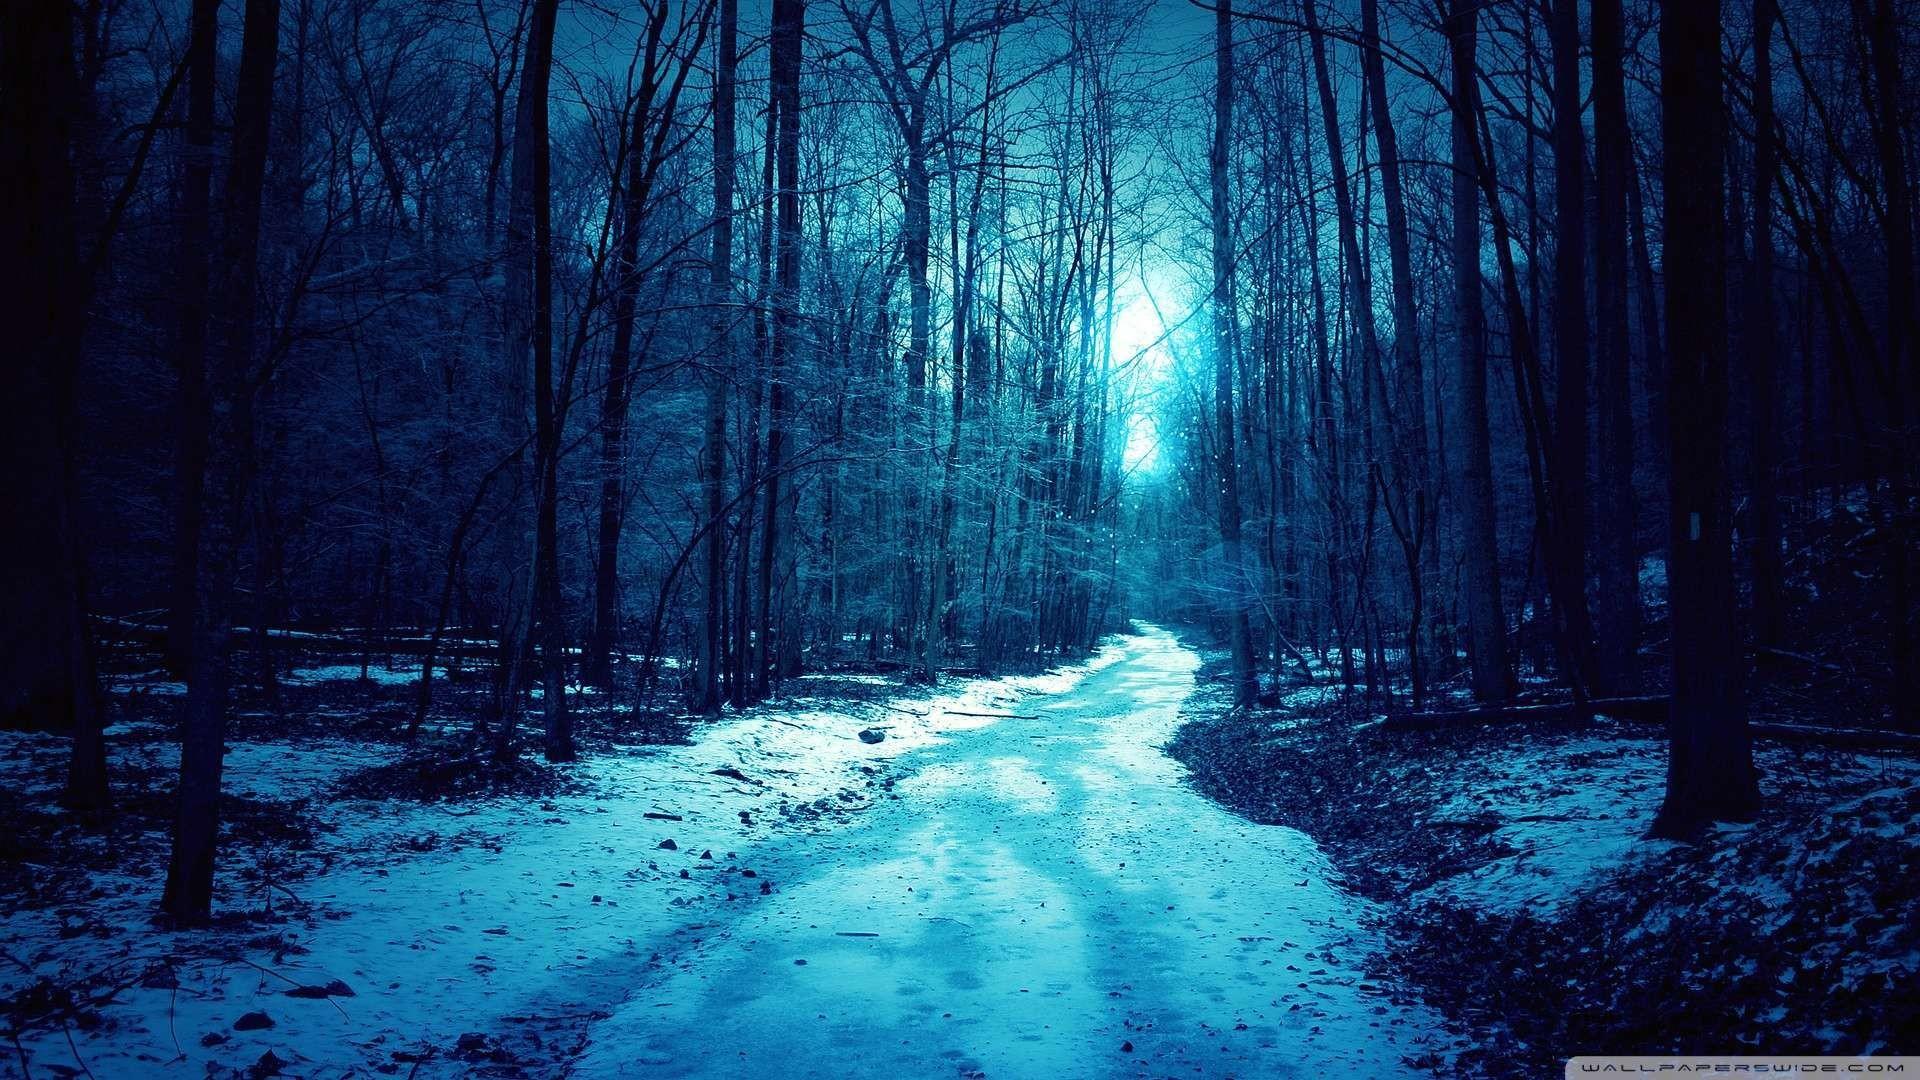 Download now: Cold Winter Day Wallpaper 1080p HD. Read description .